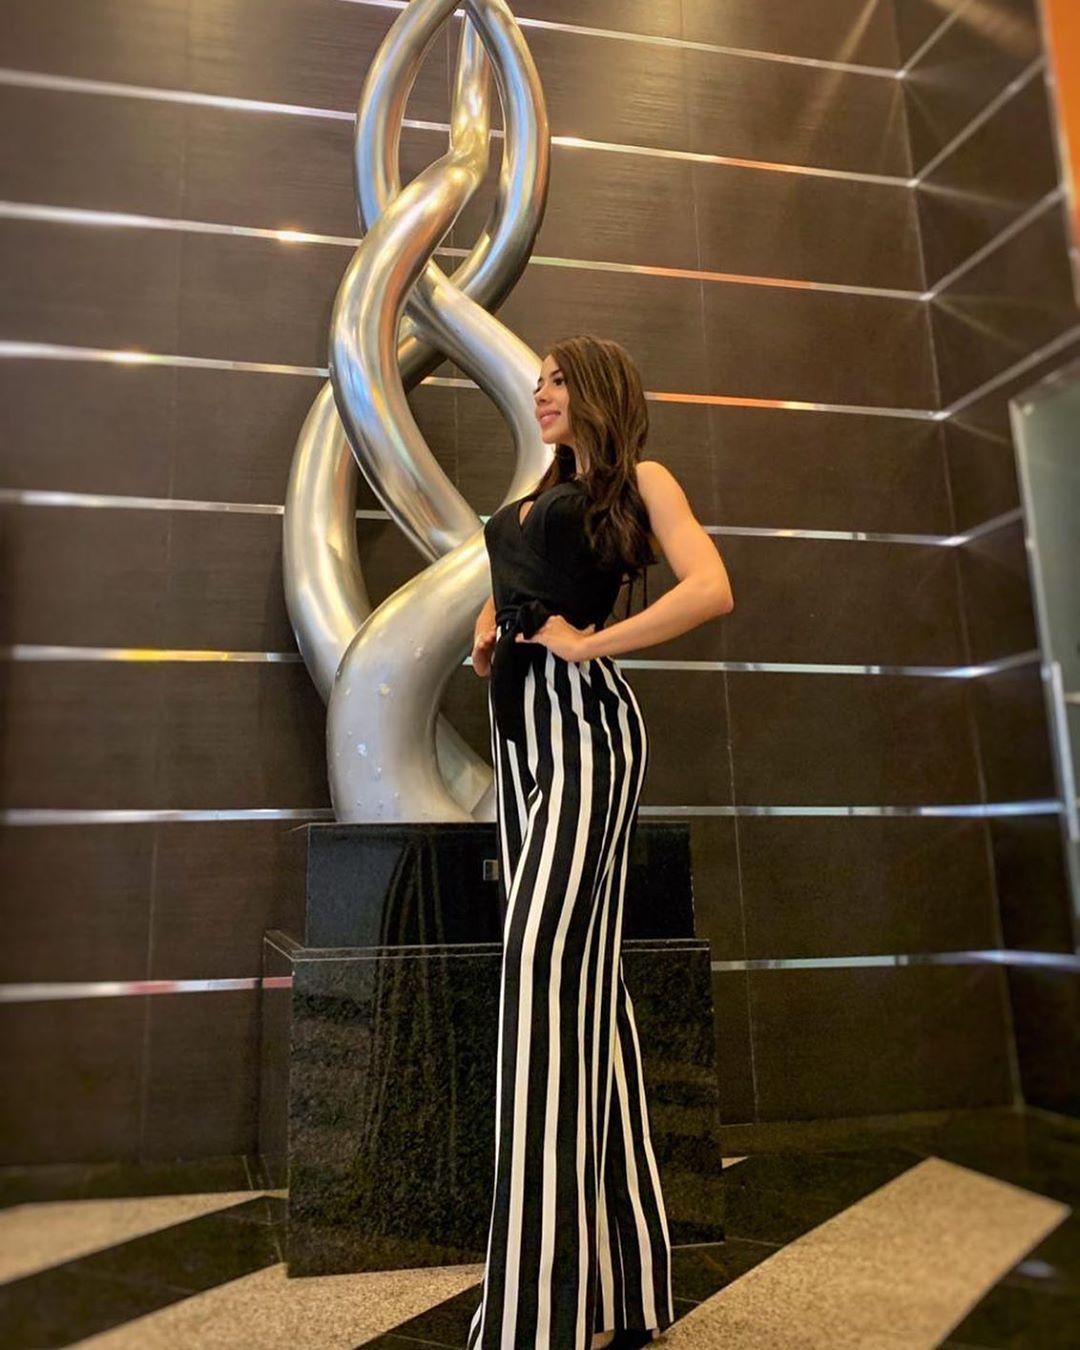 gina aguirre, virreyna de miss latinoamerica 2019. - Página 4 70246110